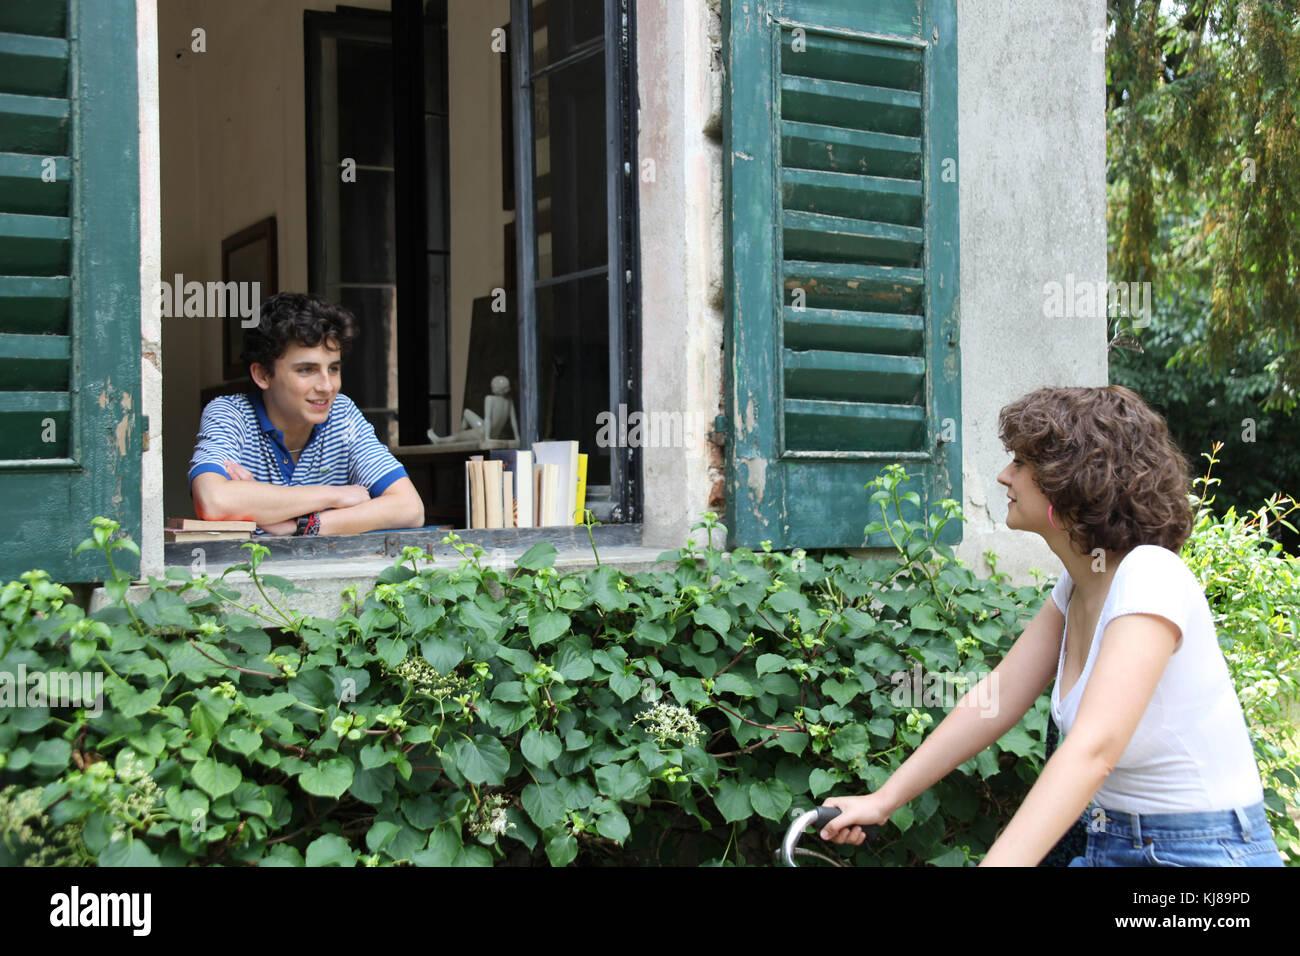 italien American Dating Service rencontres mes règles soeurs